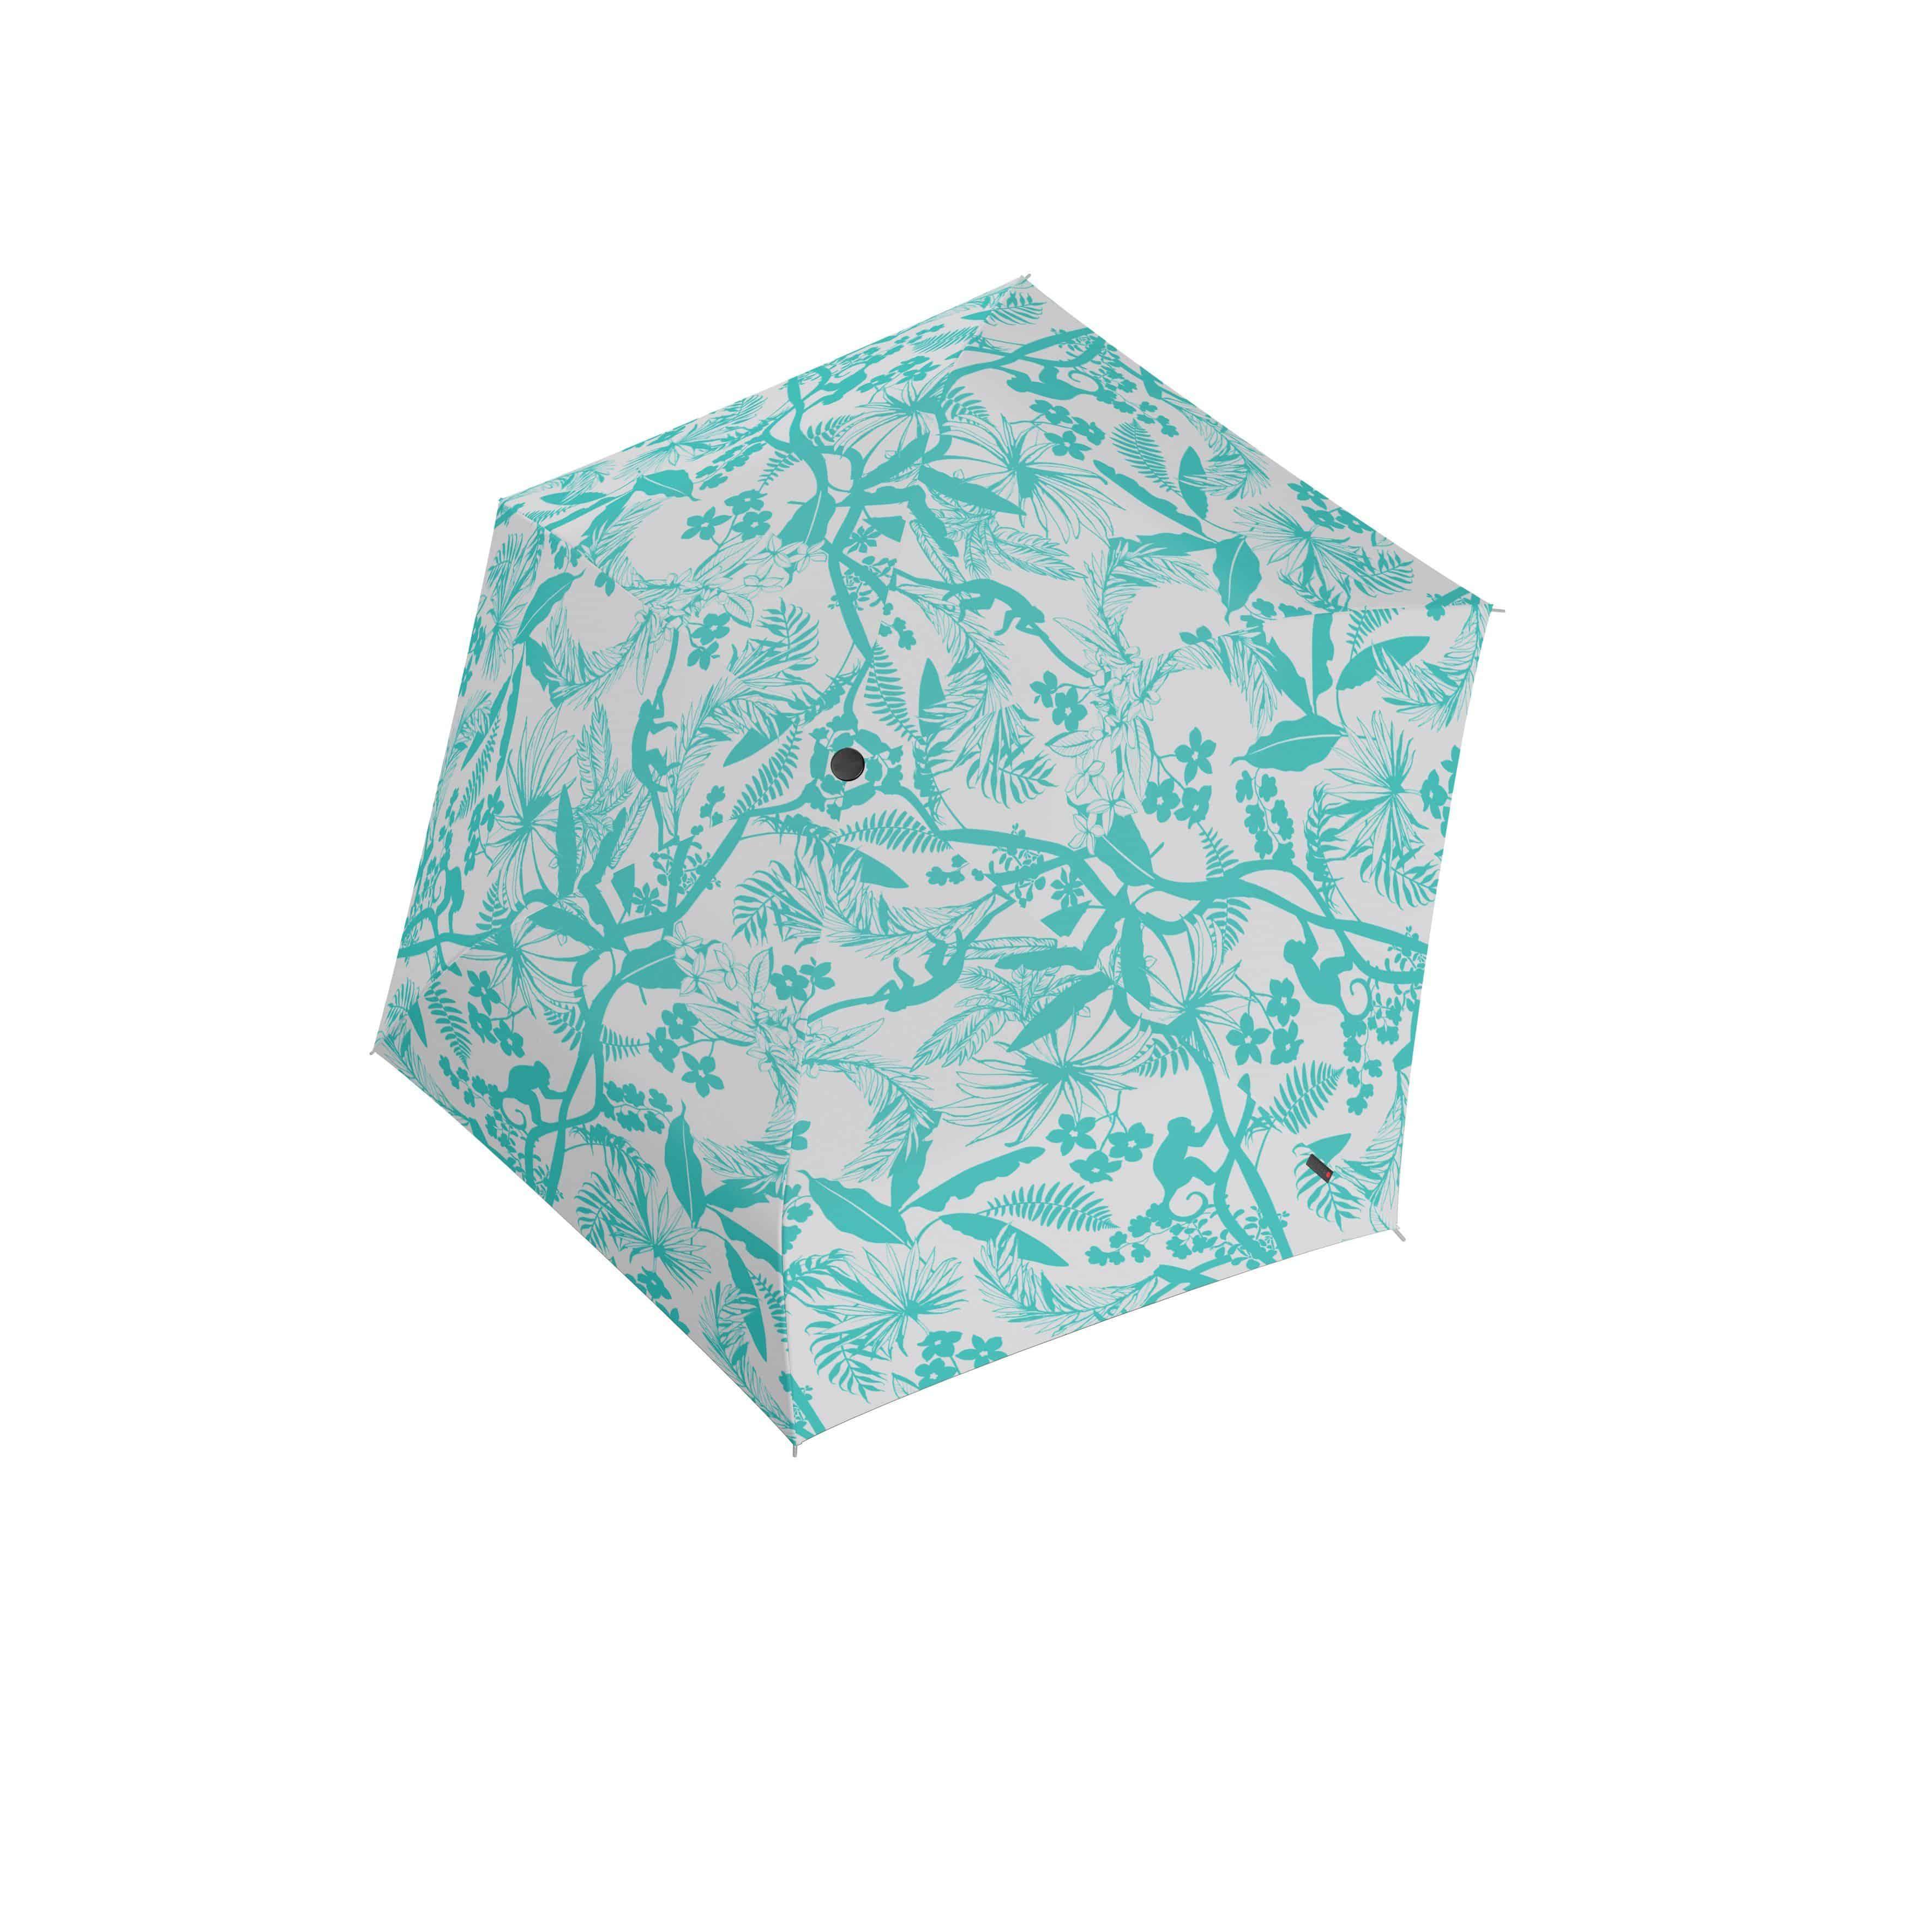 Knirps Umbrella Knirps U.200 ultra light duomatic renew stone